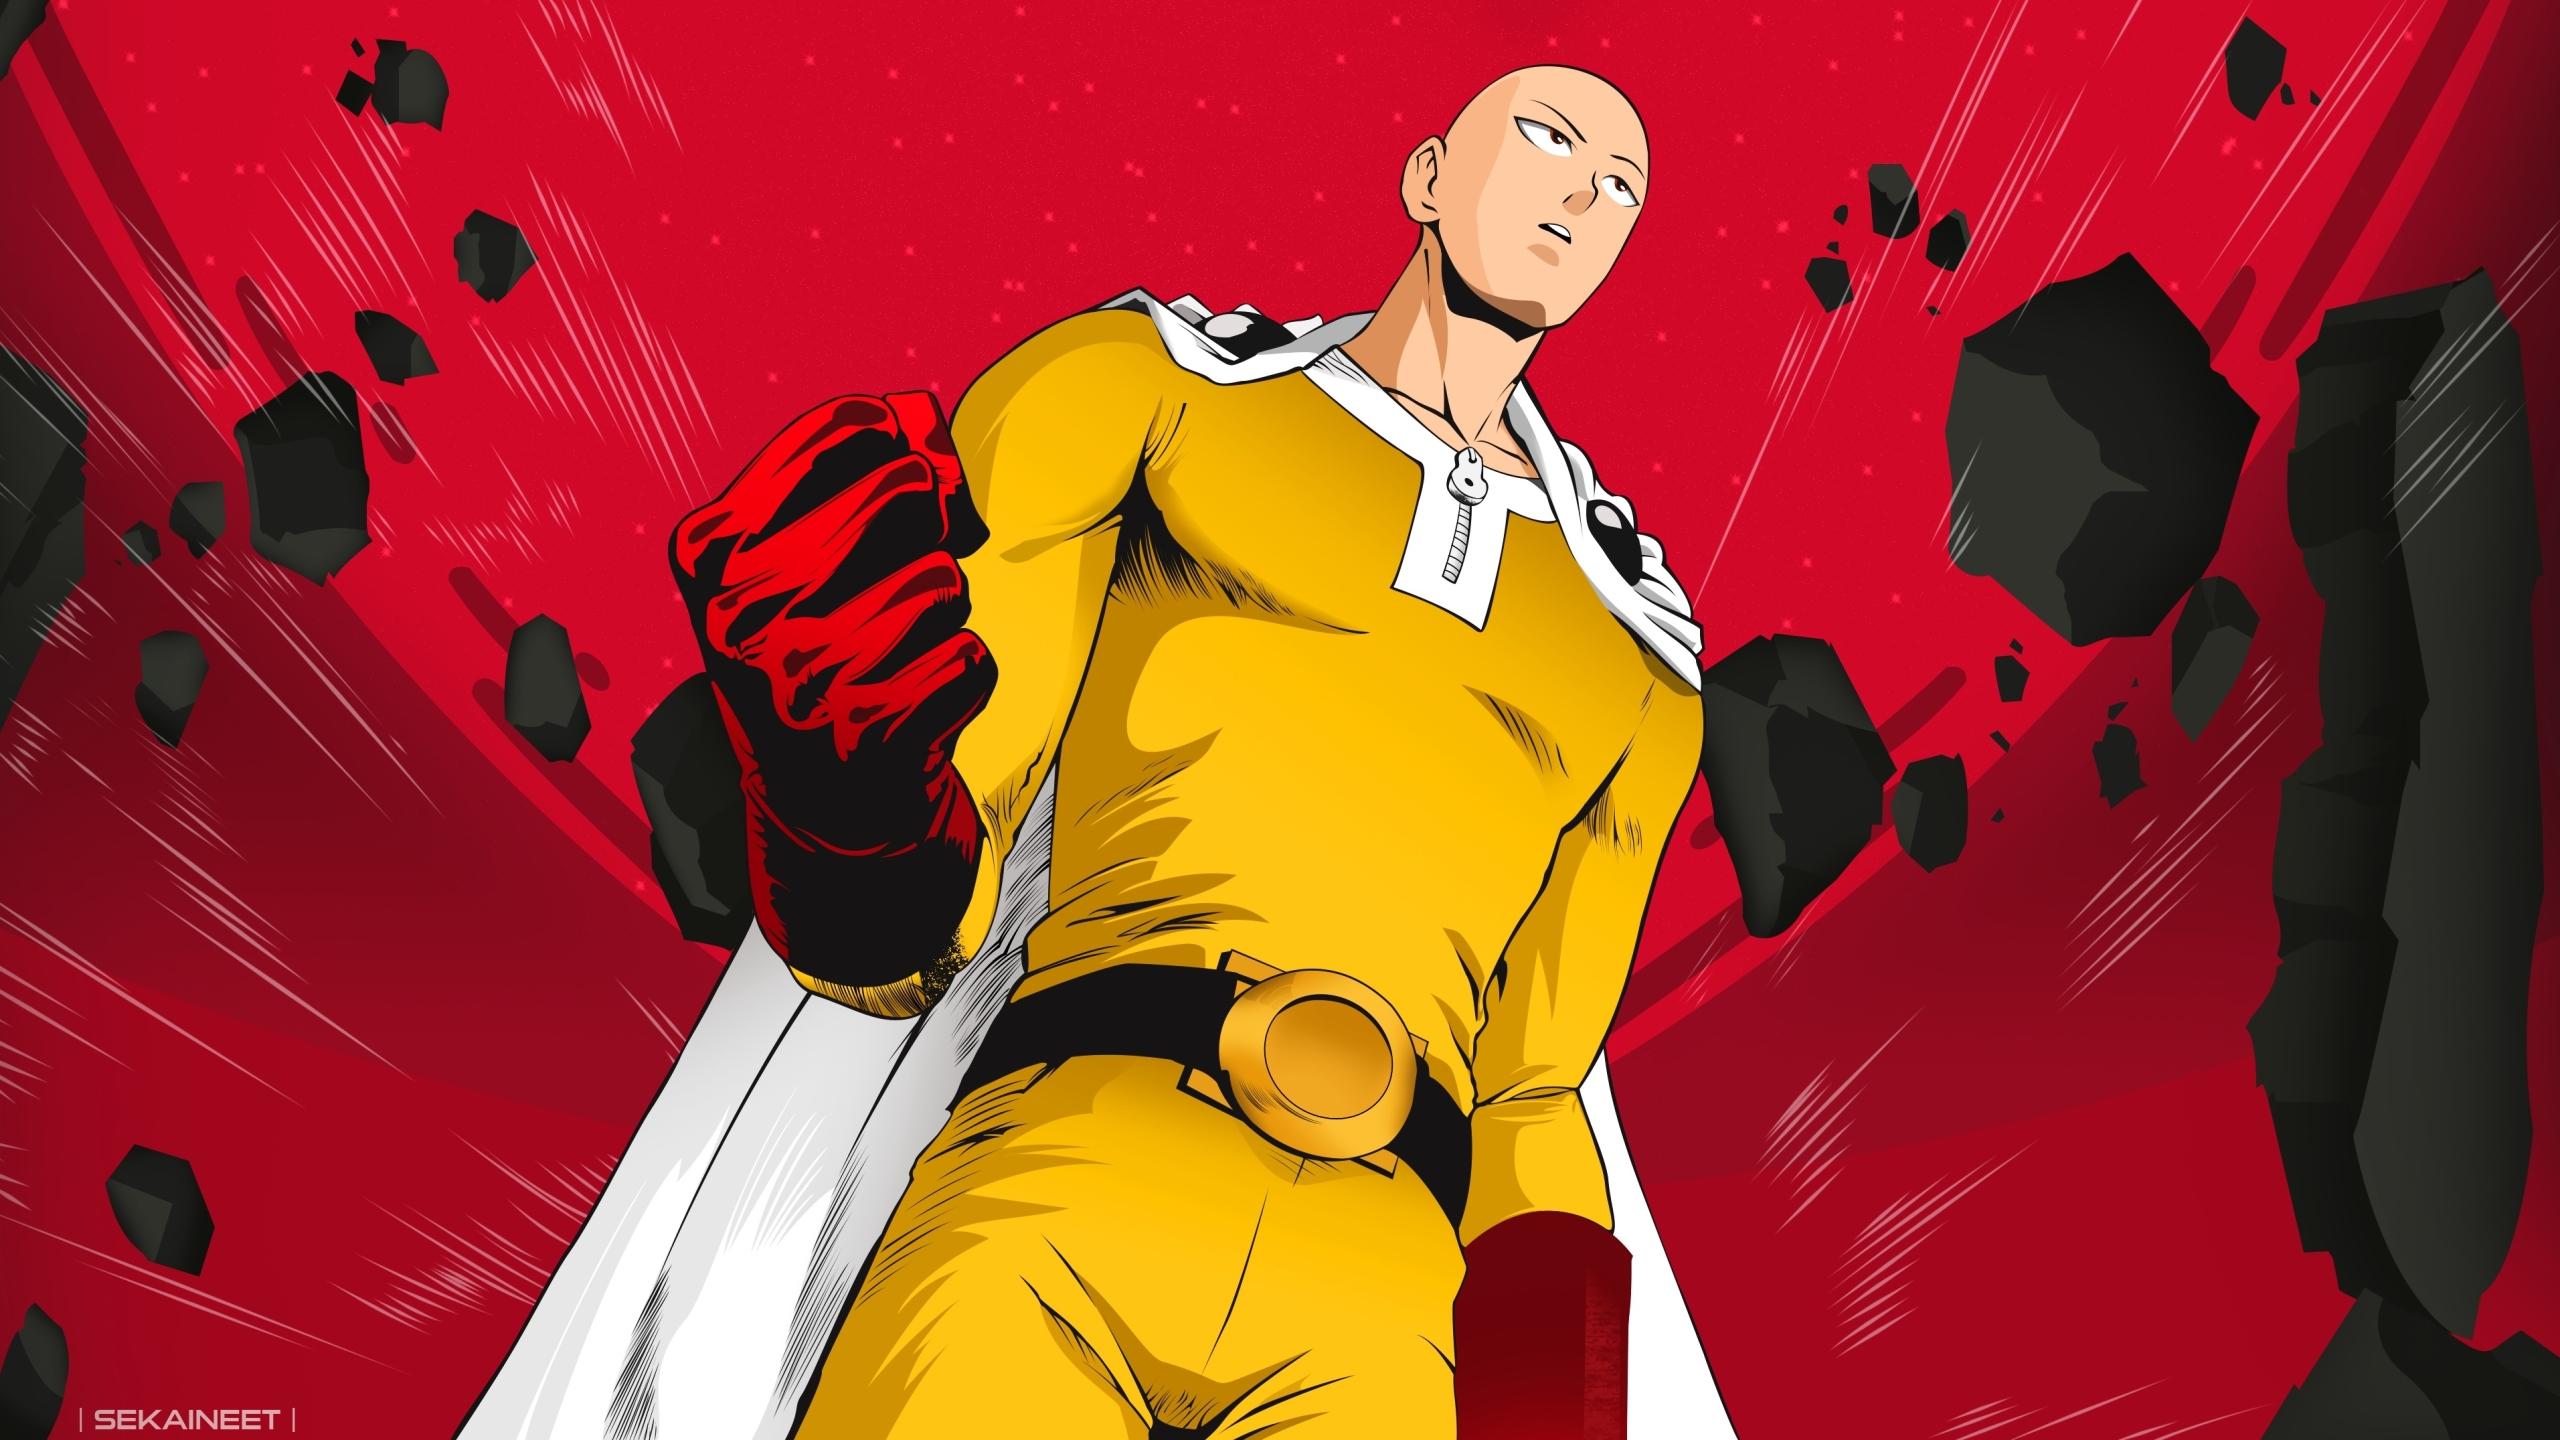 2560x1440 Saitama In One Punch Man 1440p Resolution Wallpaper Hd